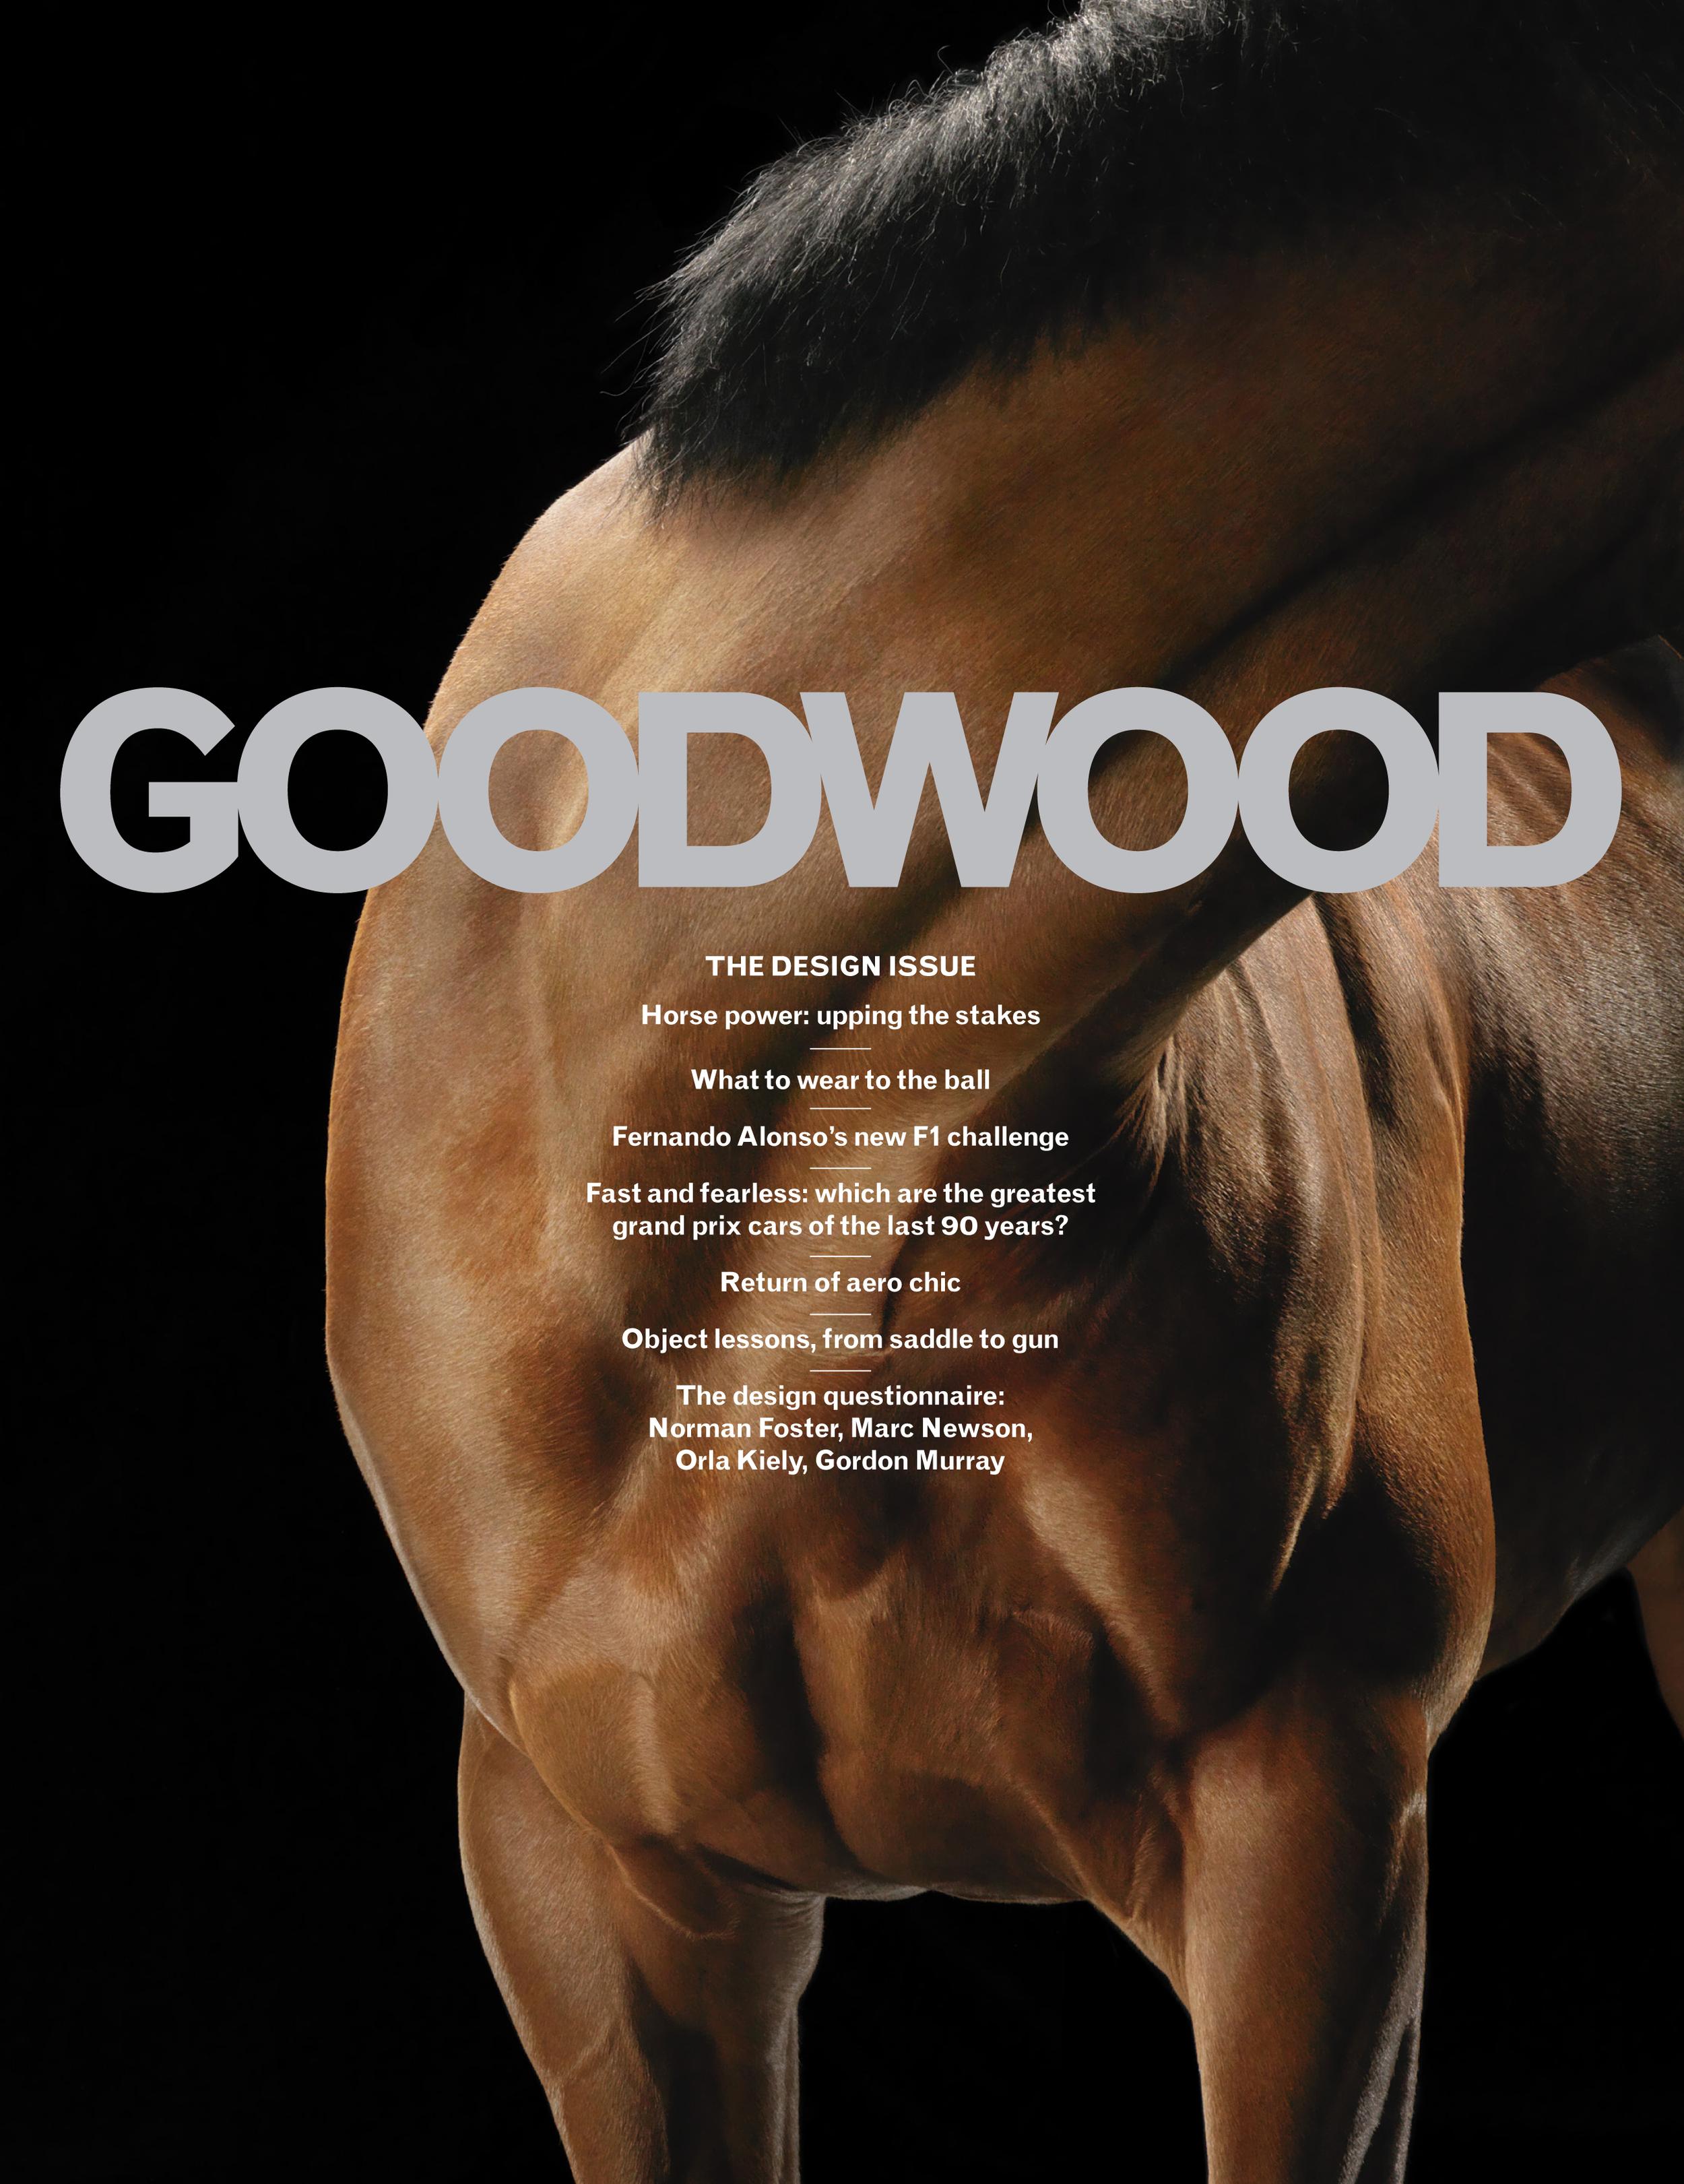 Goodwood_Inthedoghouse-1-CROP 2.jpg